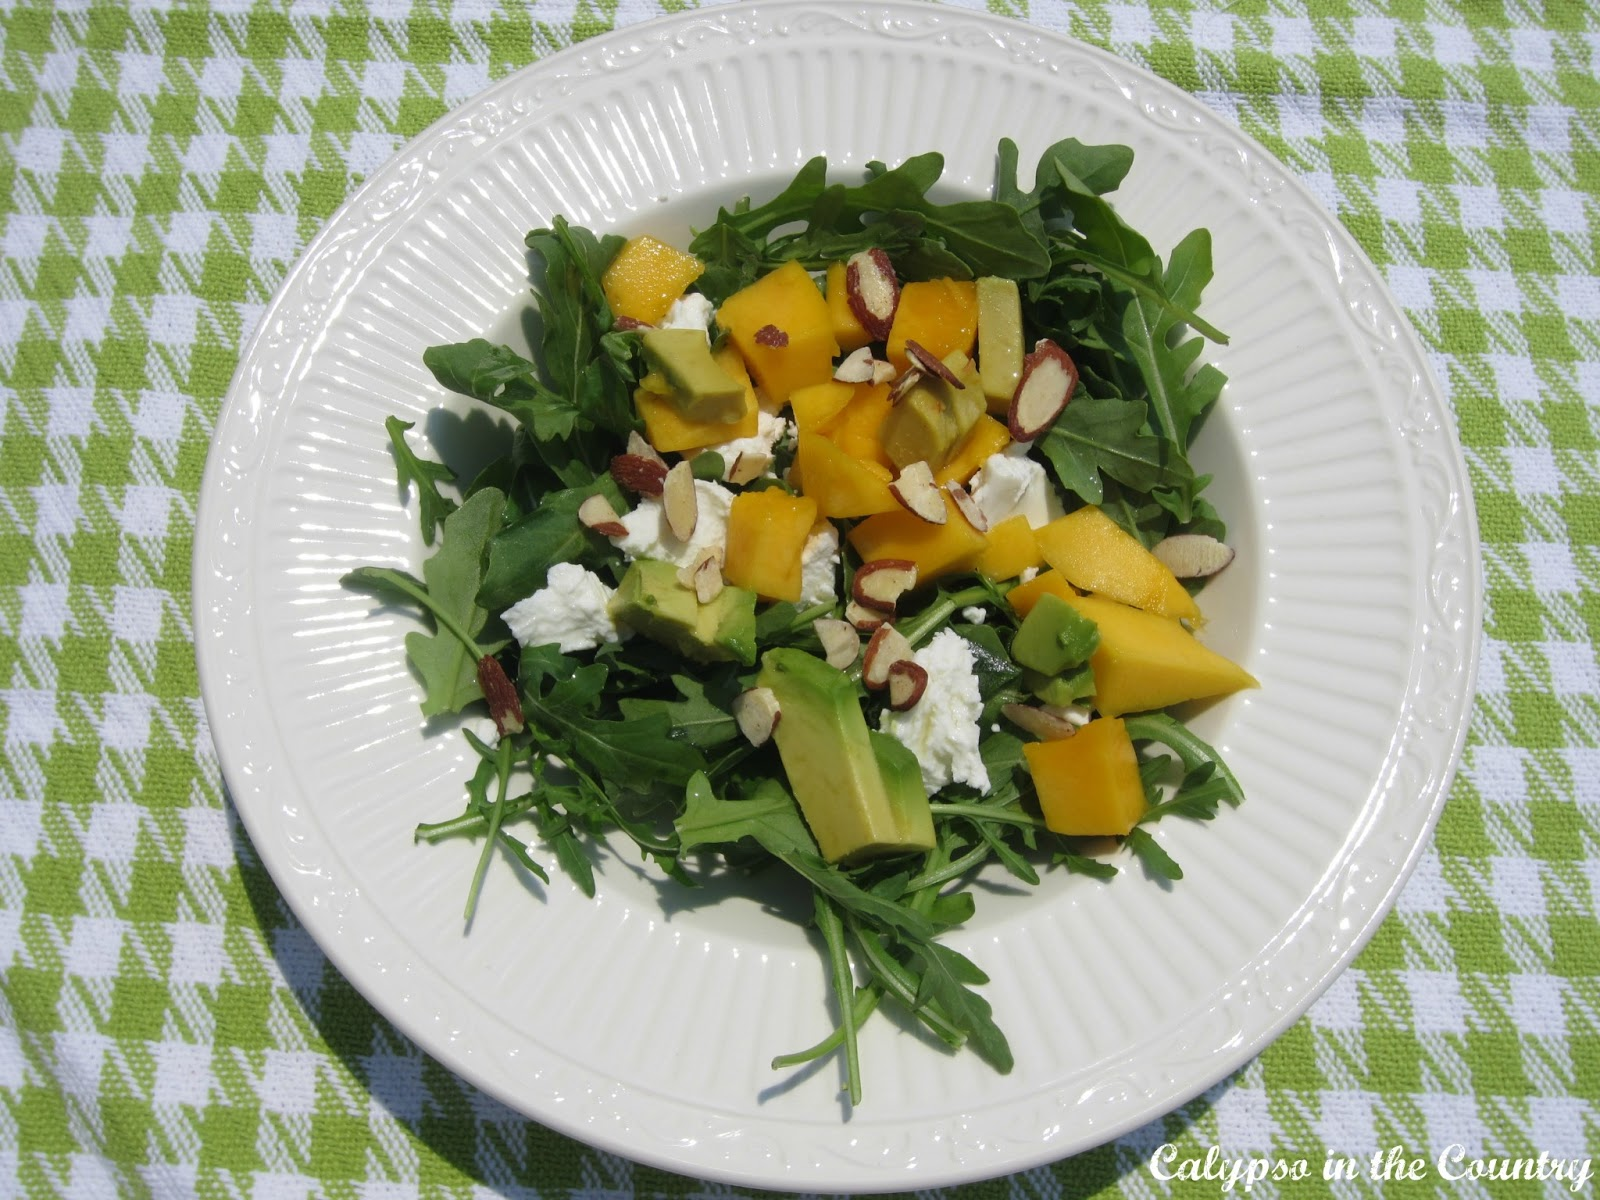 Mango and Arugula Salad